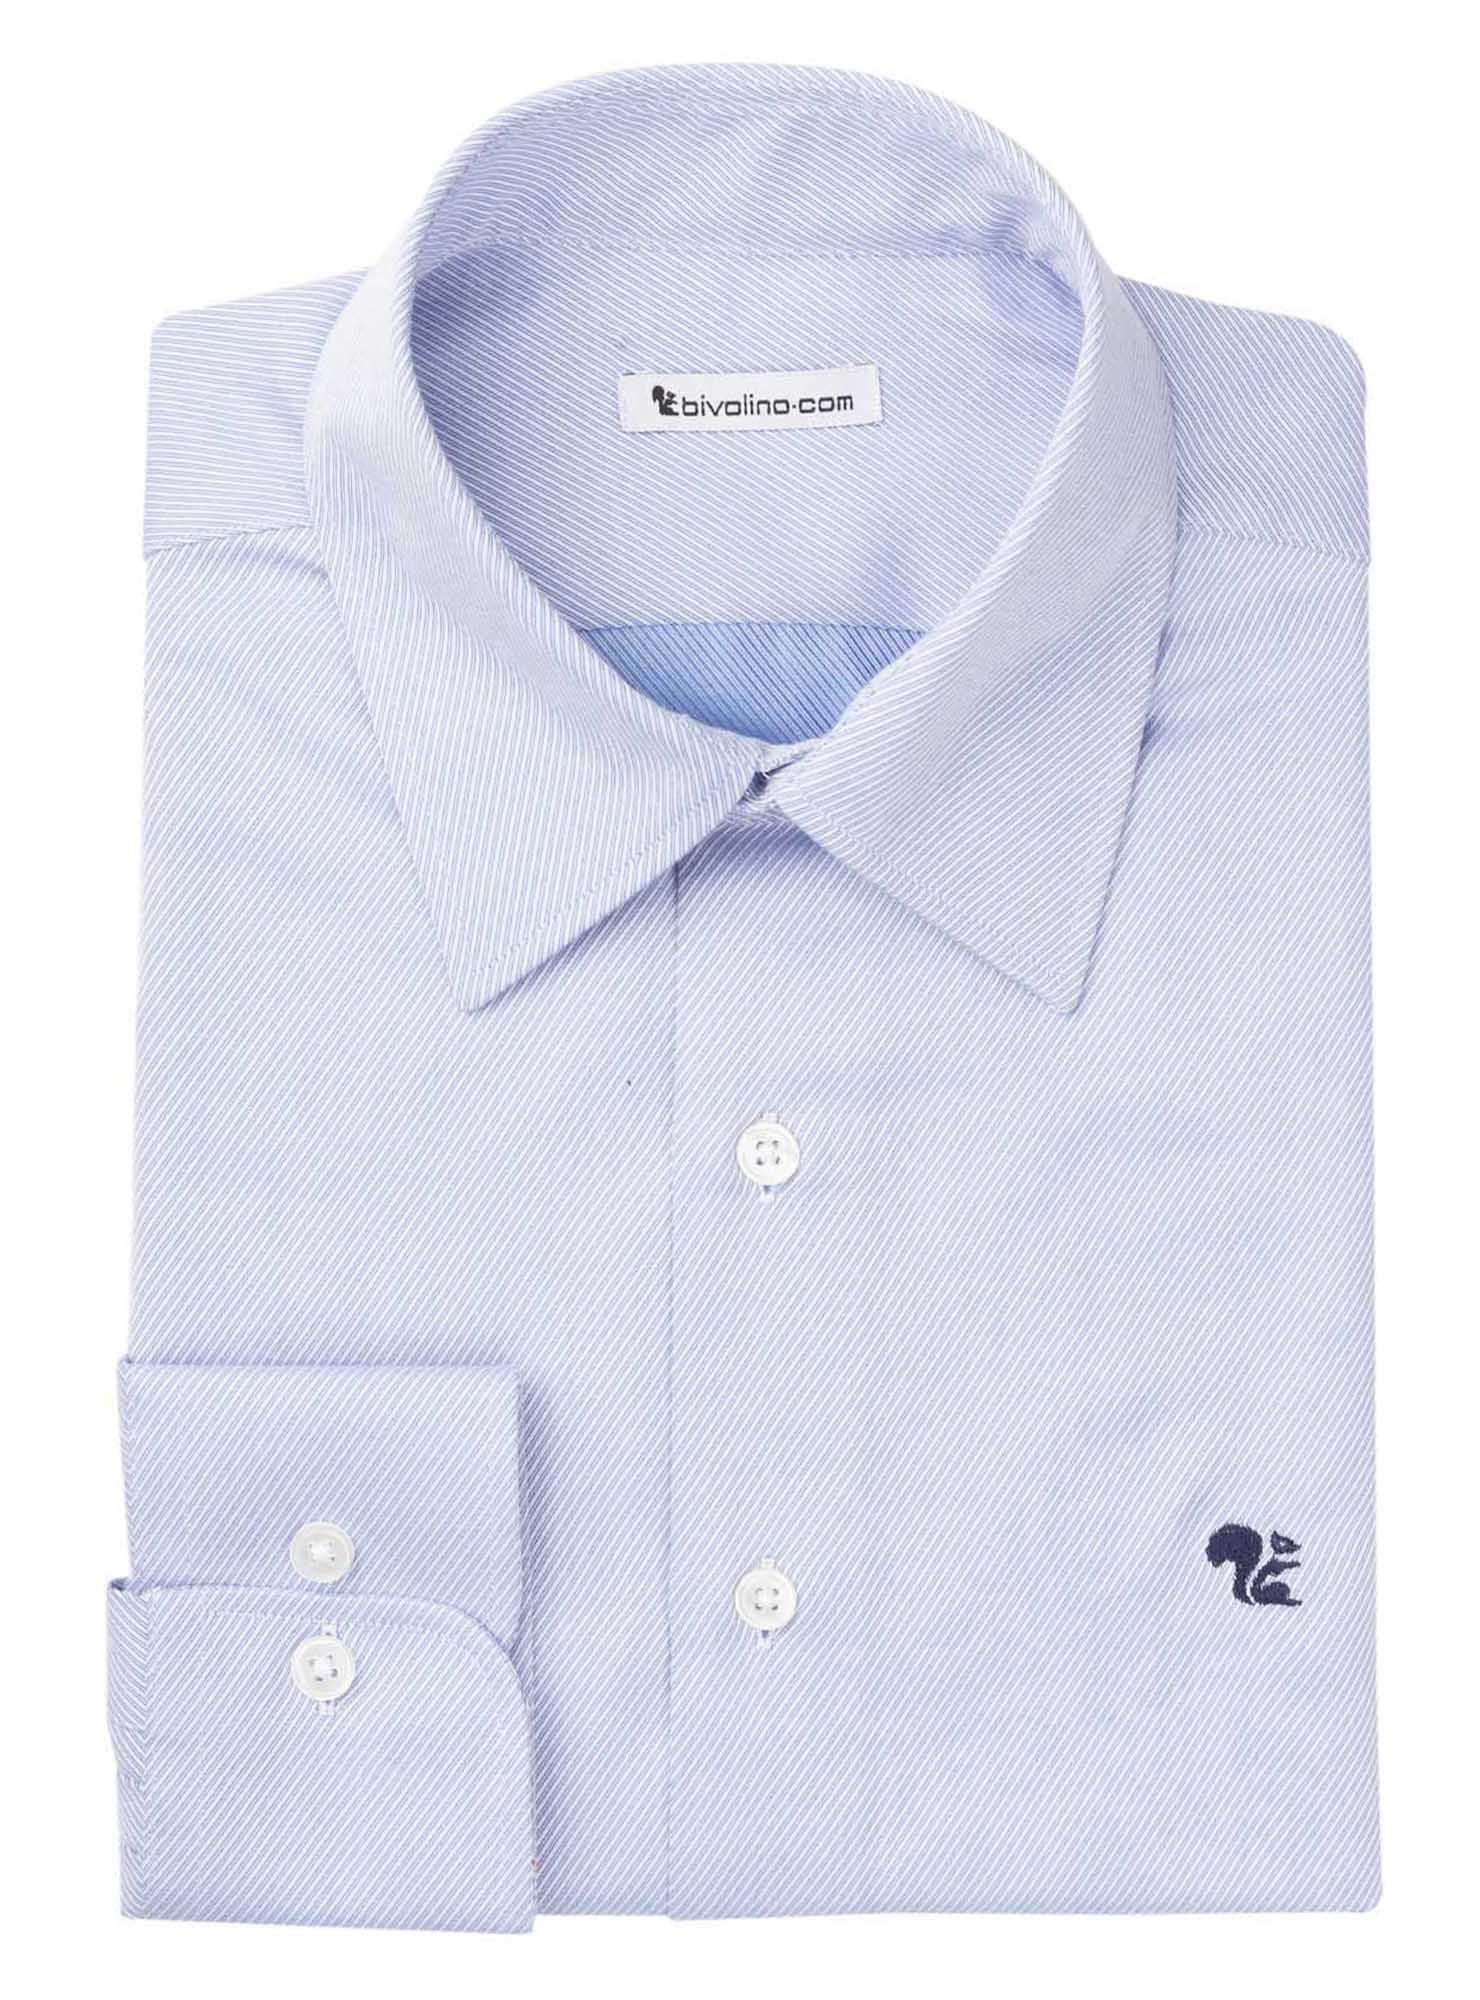 PADOVA - Männerhemd Baumwolle  - ROCO 5 CAVALRY